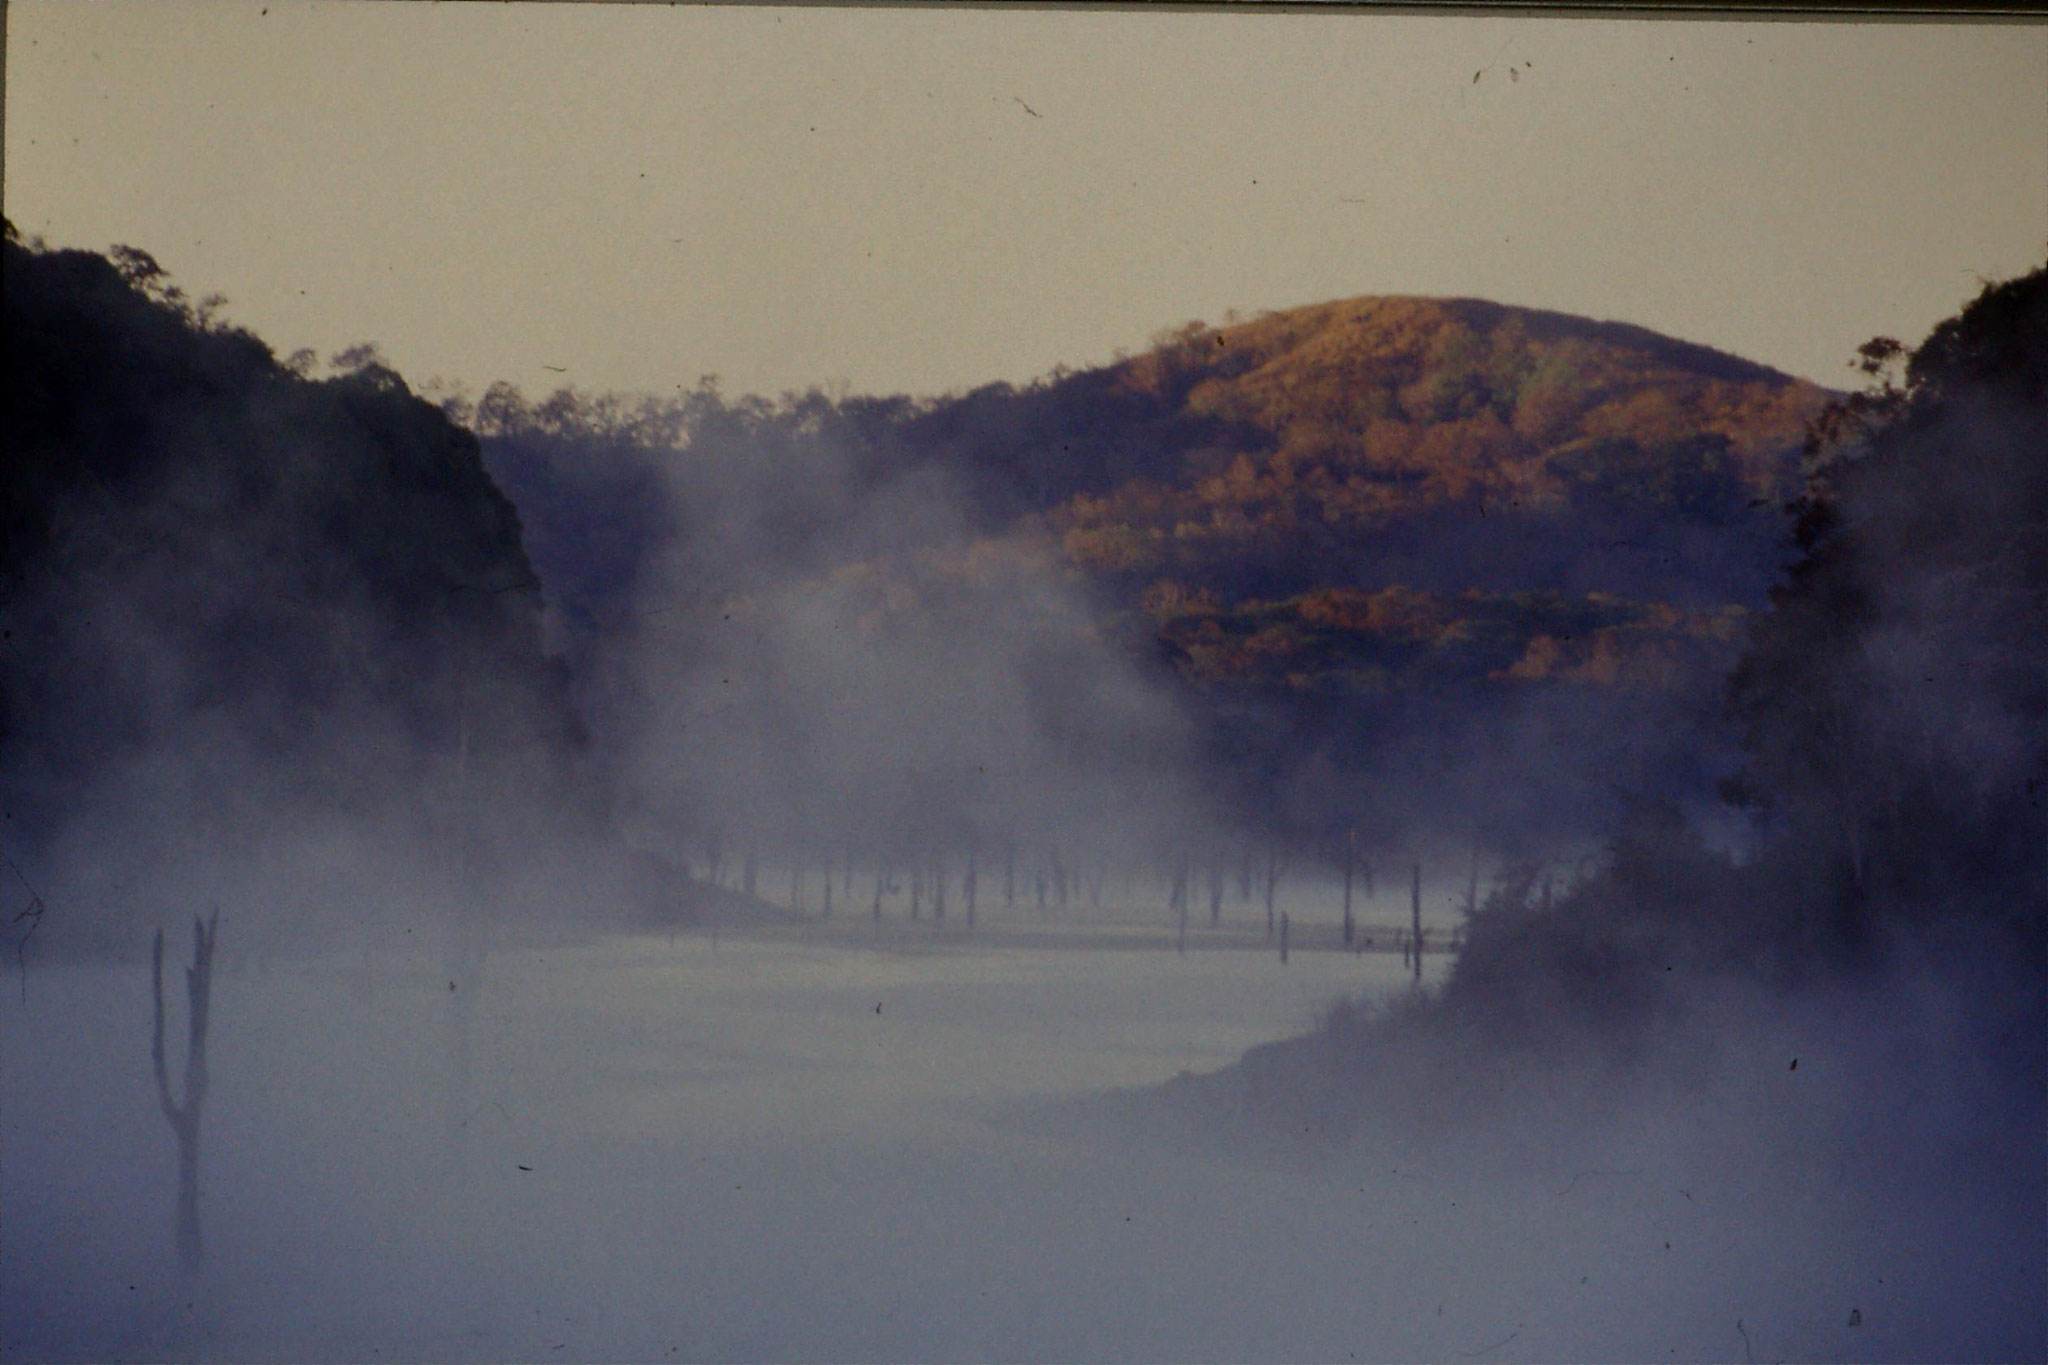 104/35: 23/2/1990 Periyar mist on lake in morning